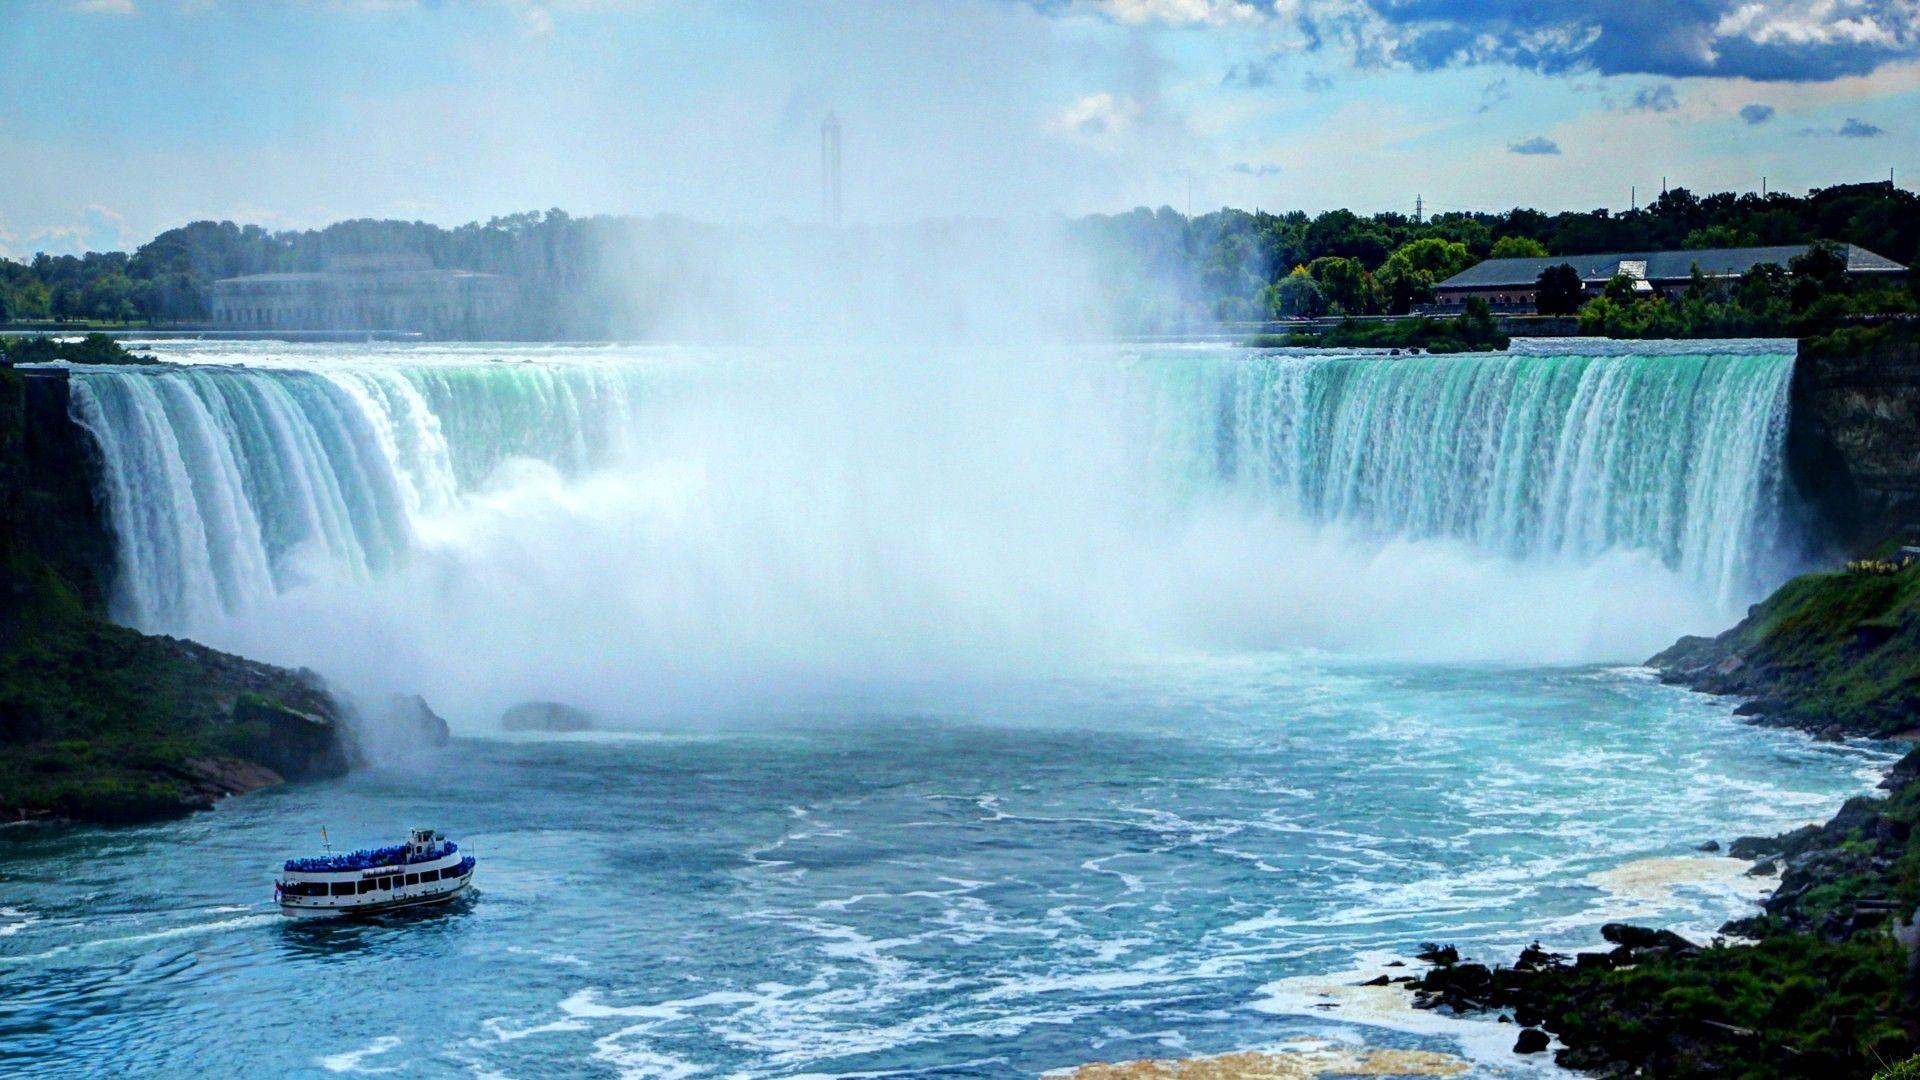 Beautiful Wallpaper Of Niagara Fall 1920x1080 Niagara